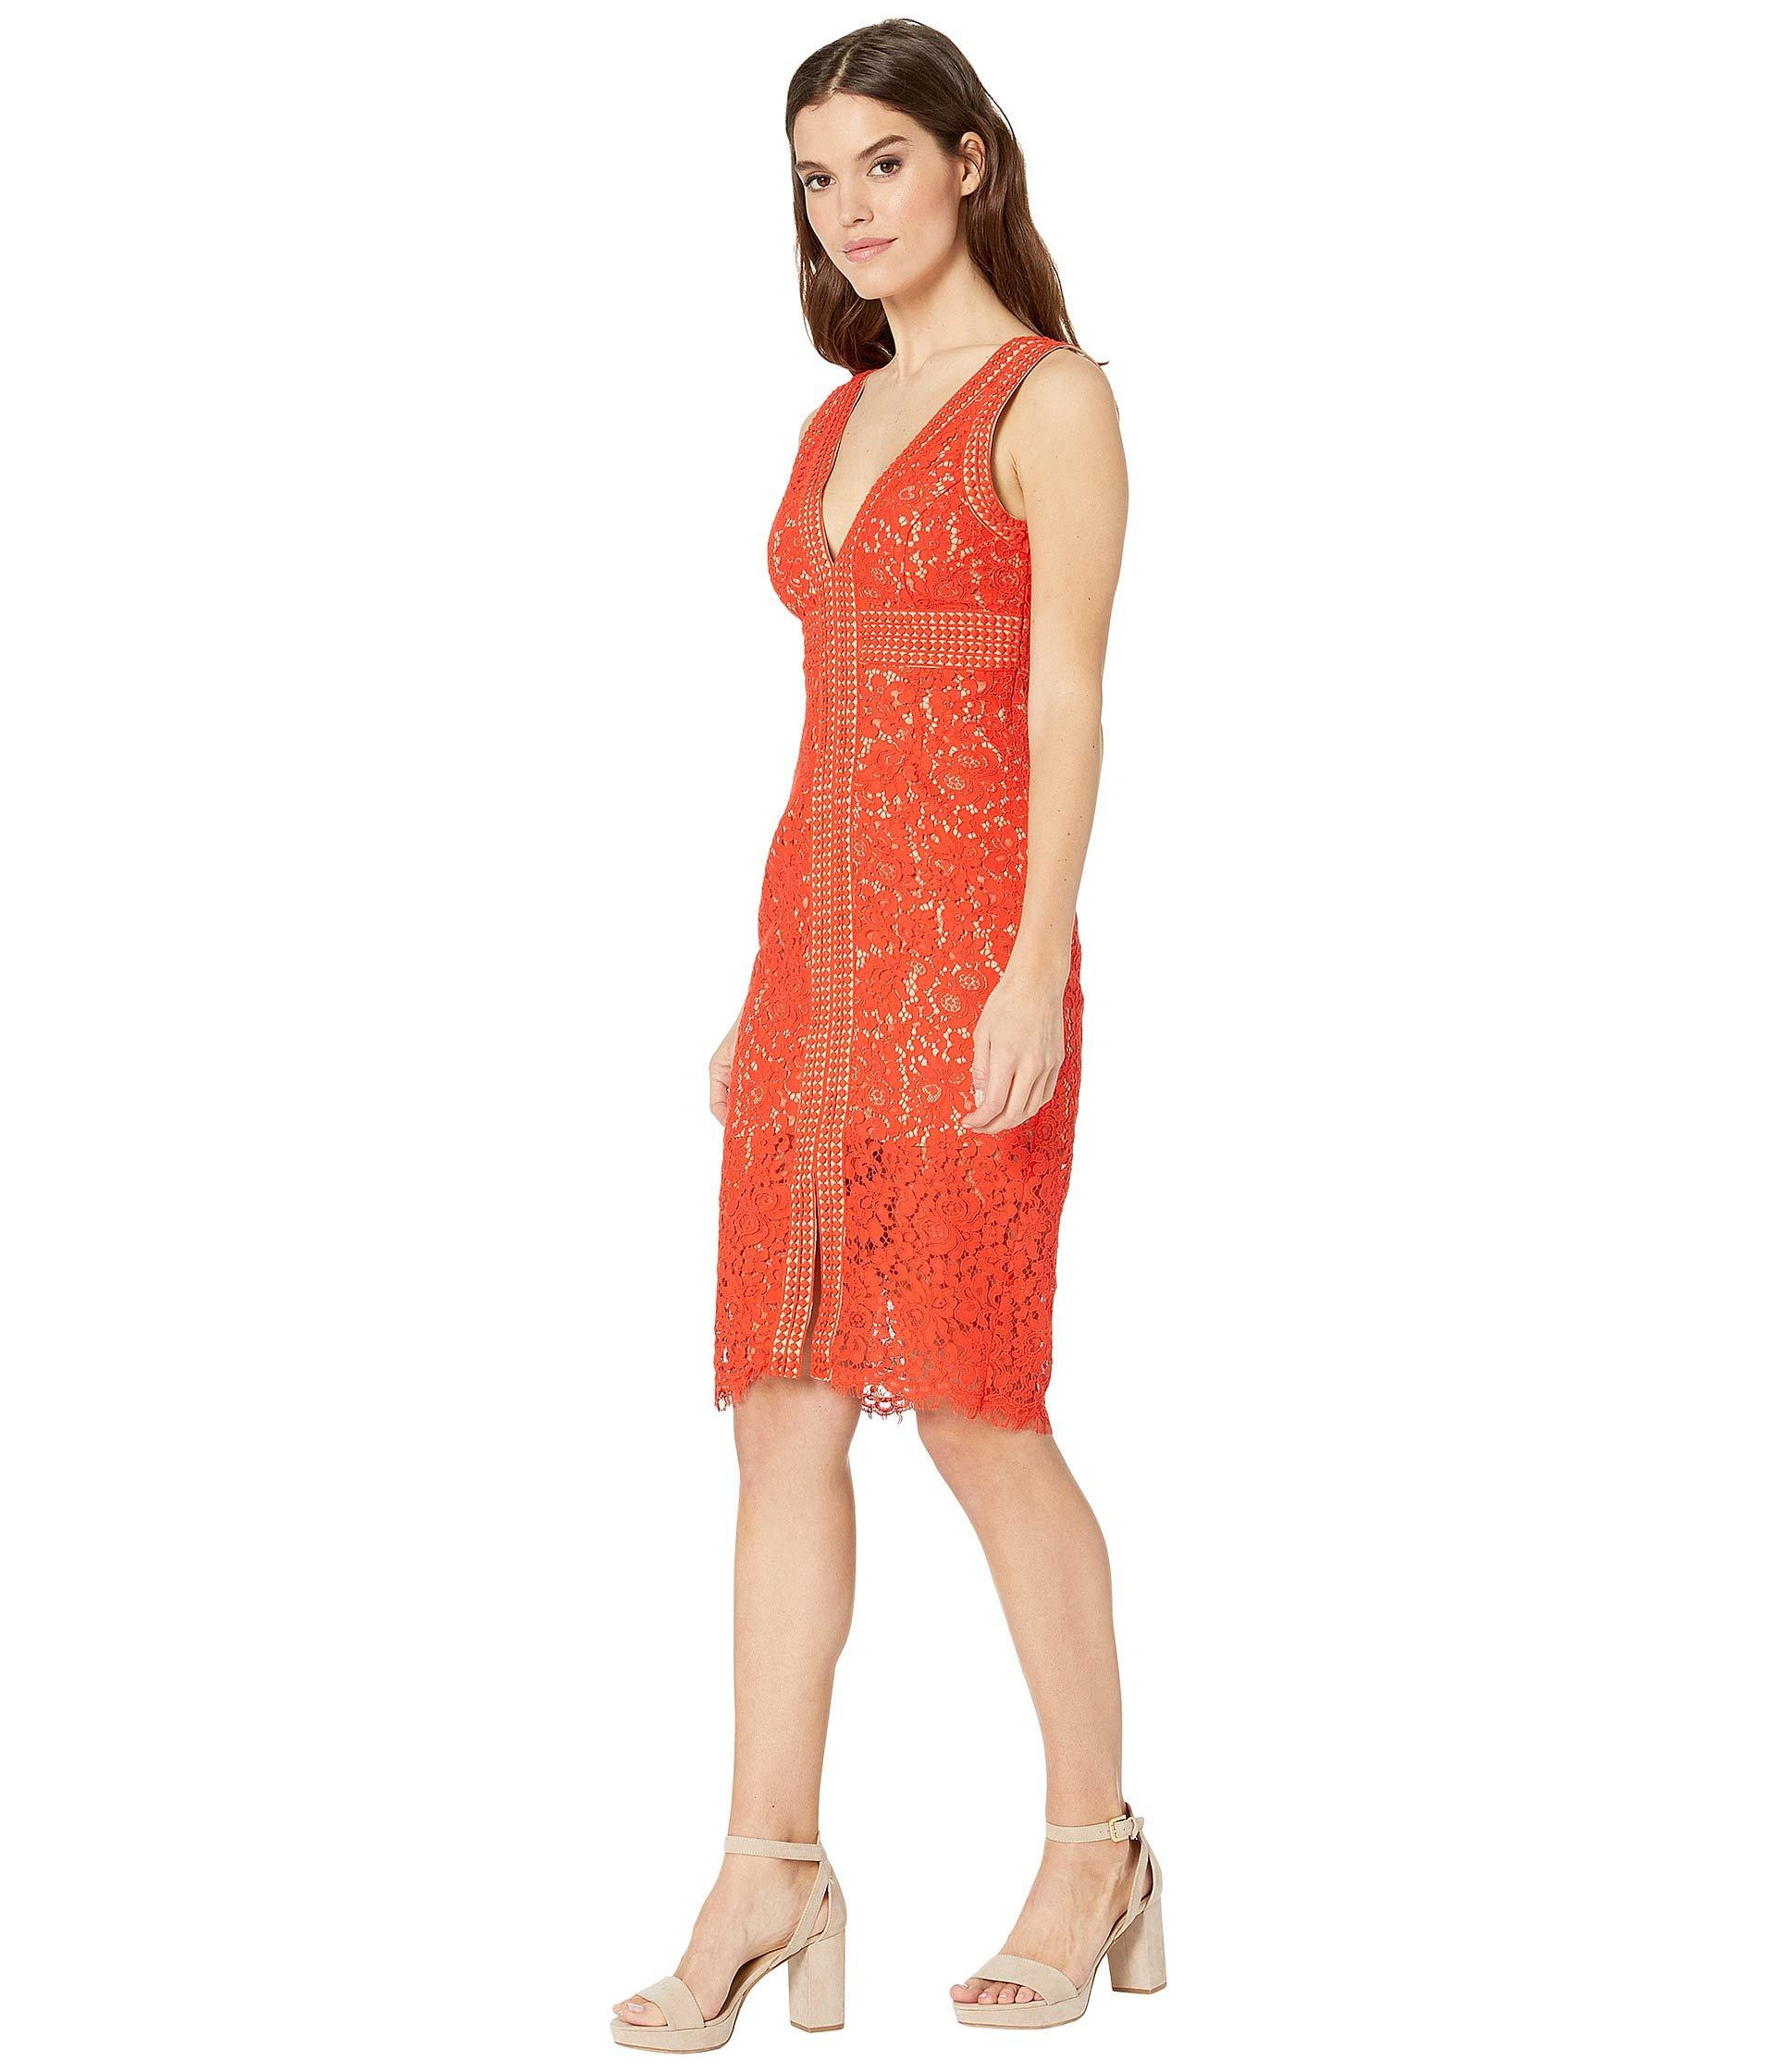 eb5e2d9716e8 Bardot Morgan Lace Dress (black) Women's Dress in Red - Lyst